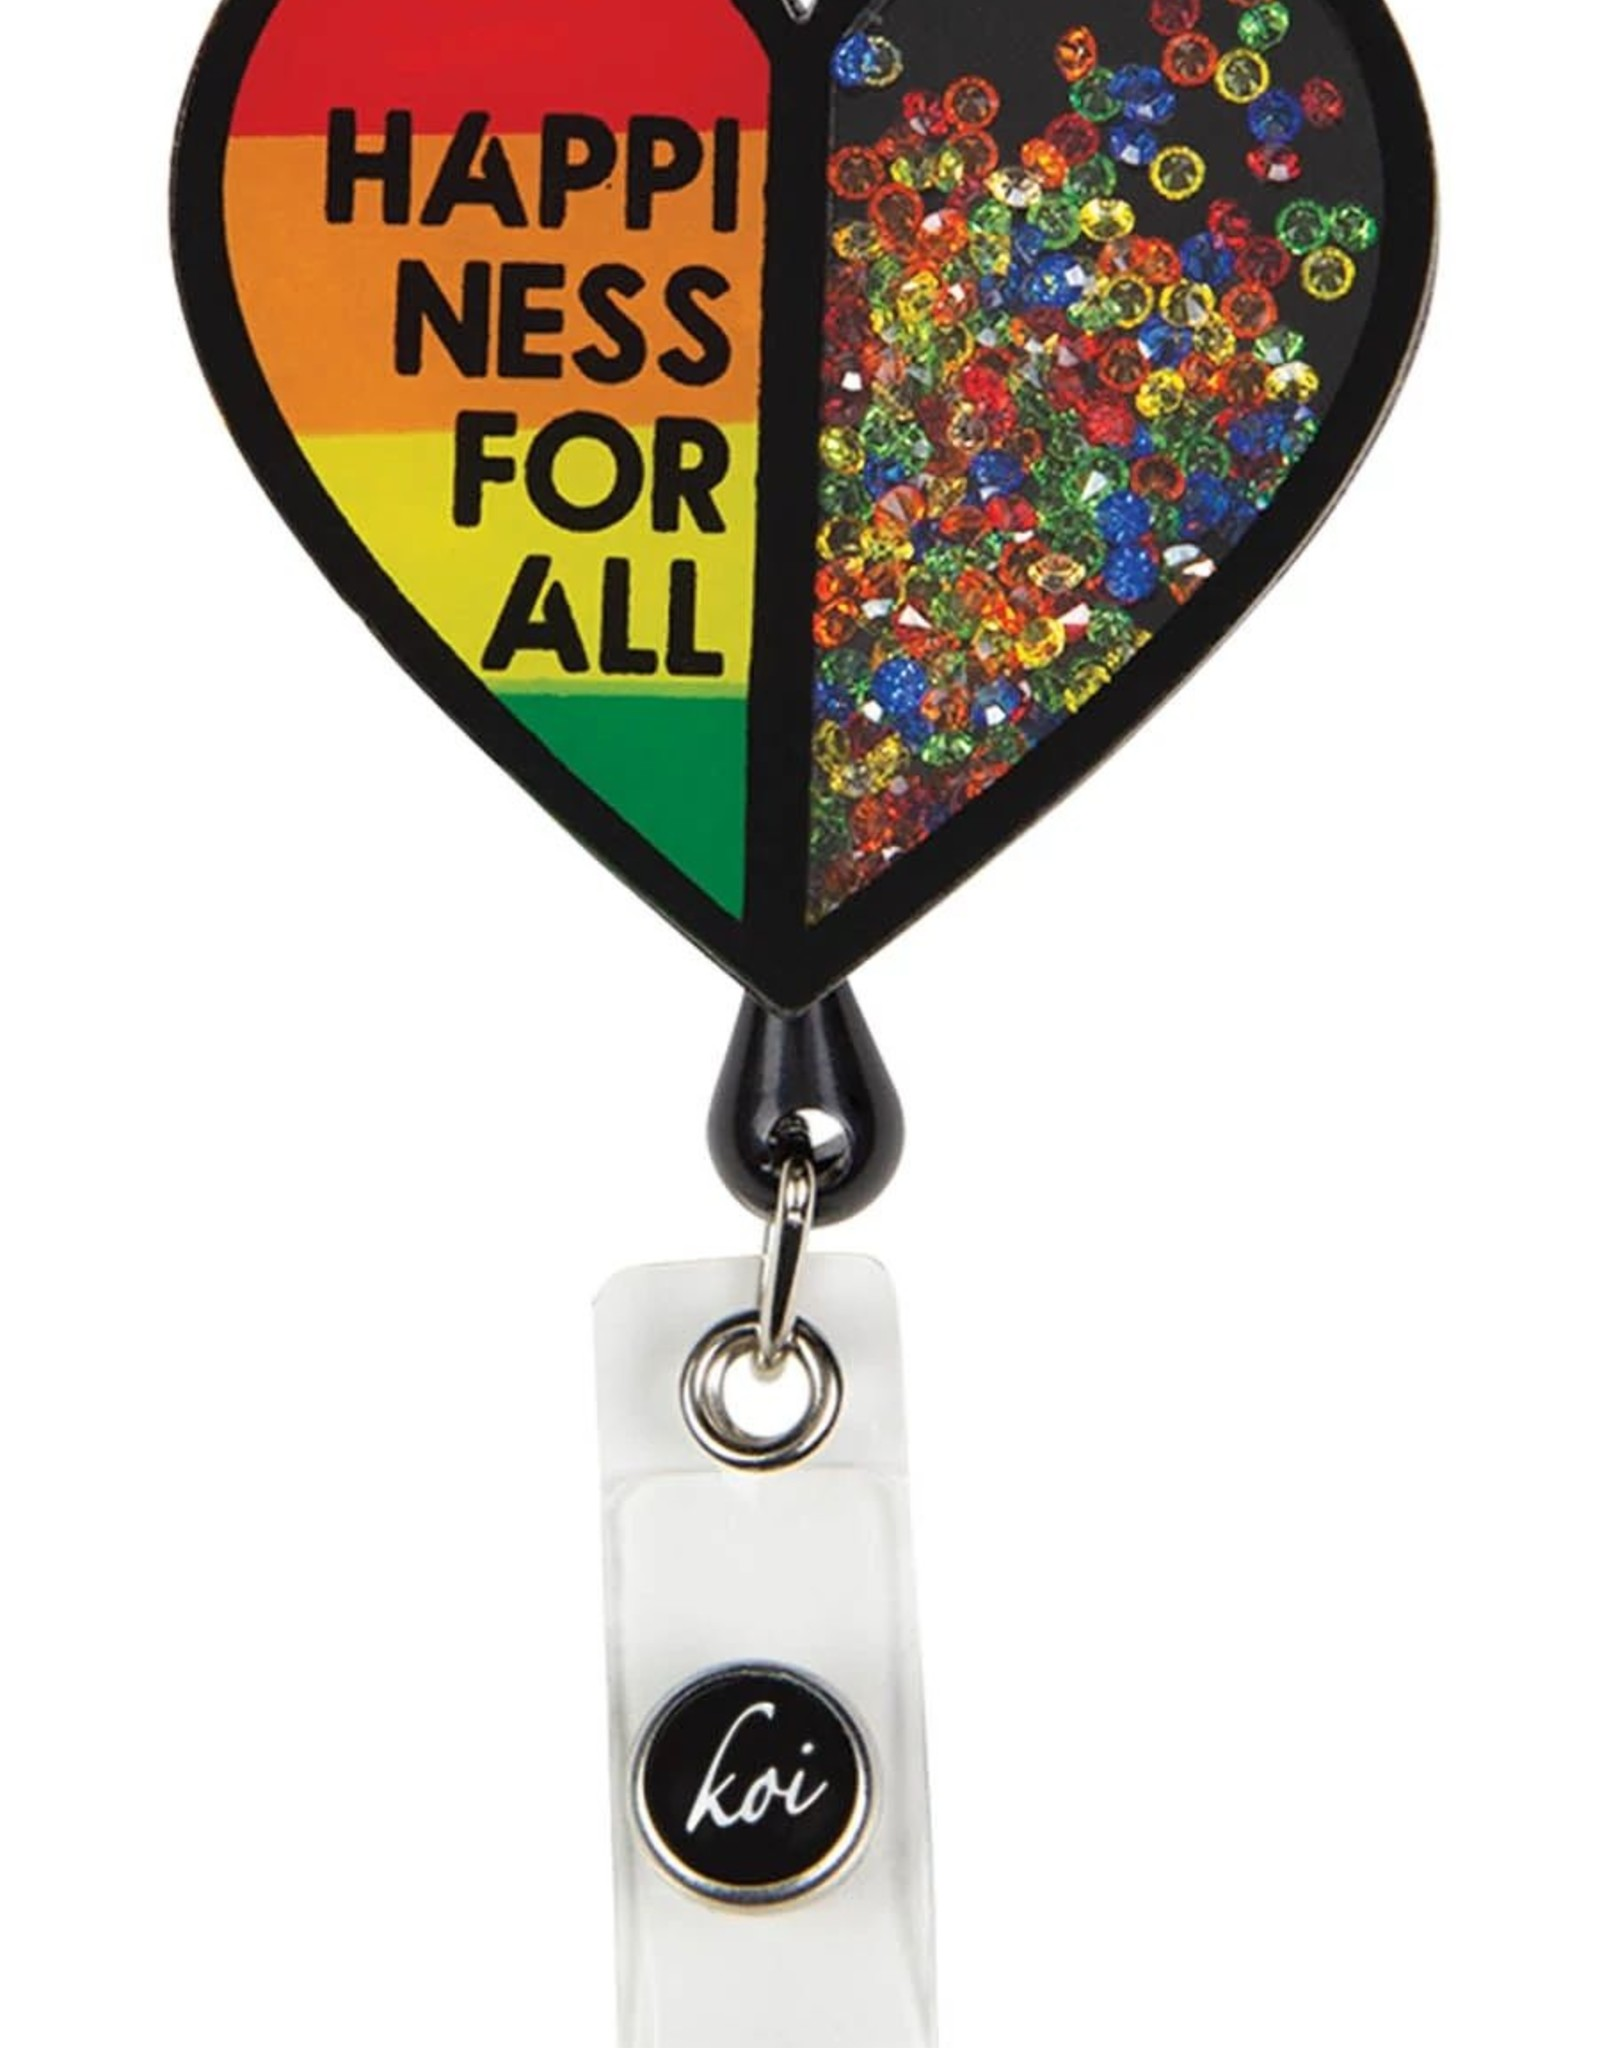 Koi  Name Badge A156 Happiness